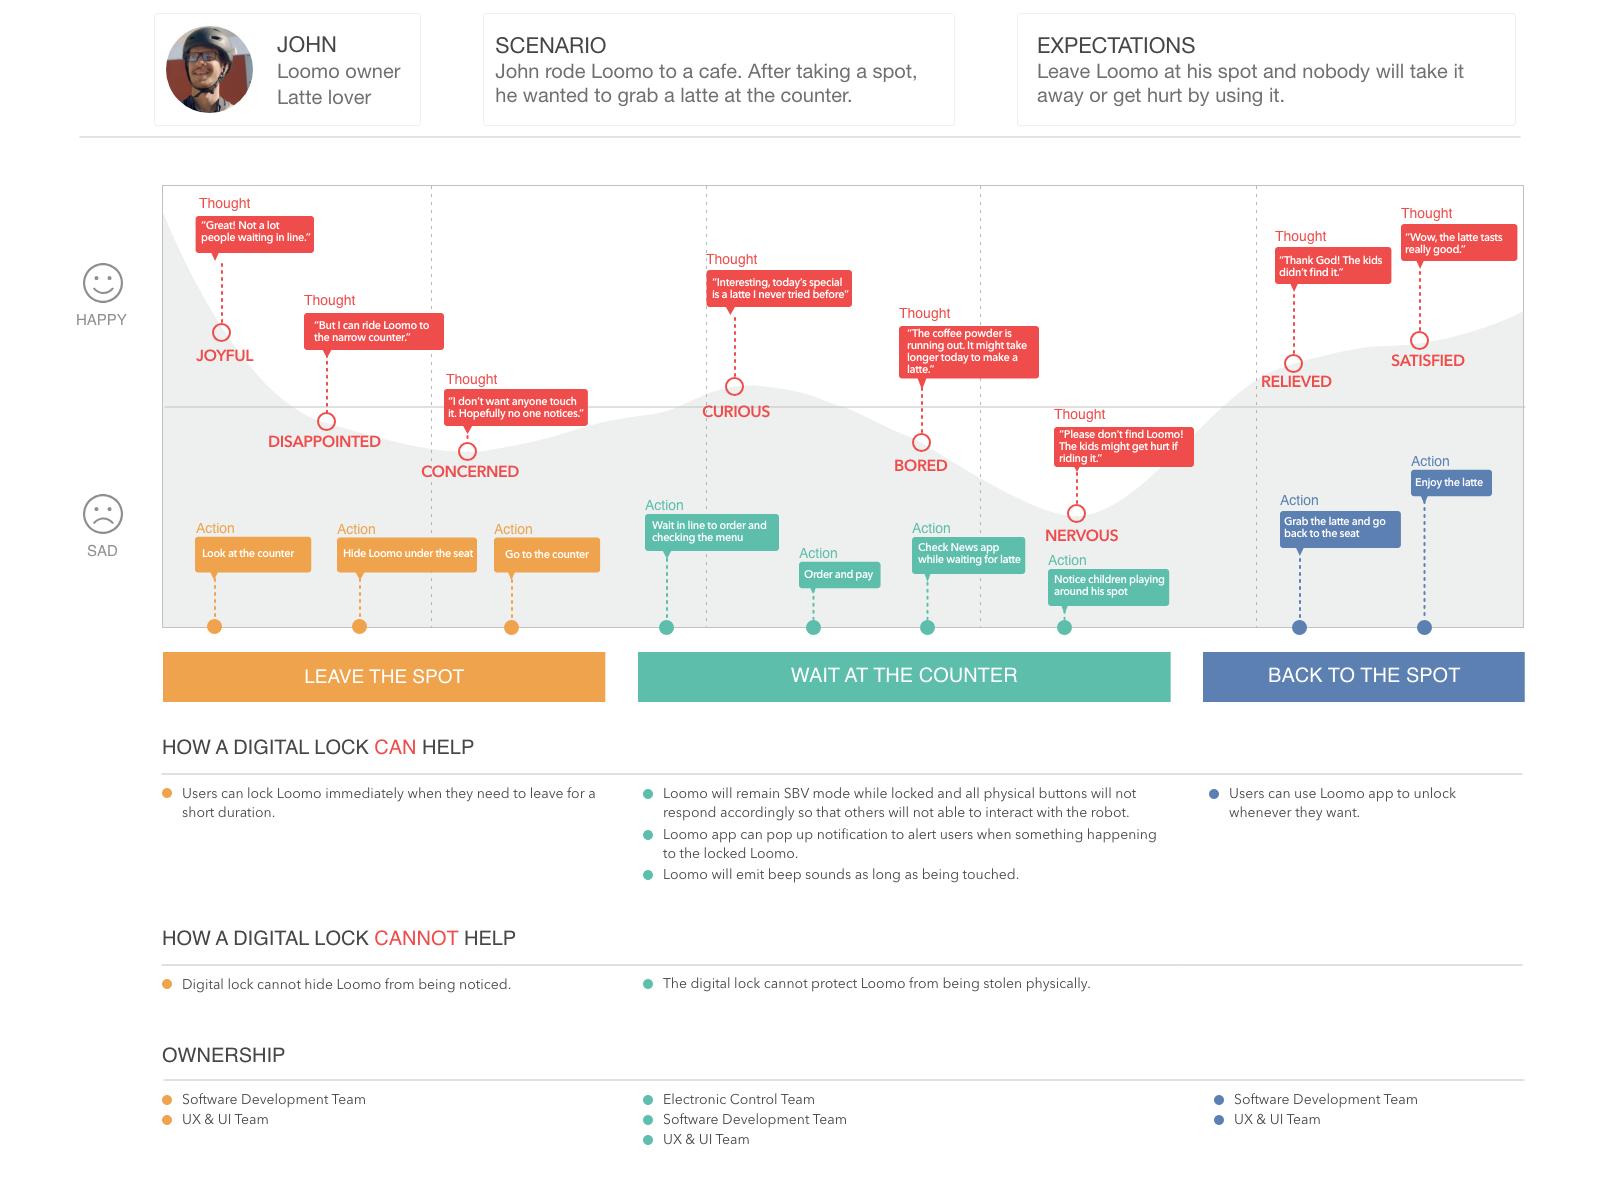 User journey map for a Loomo digital lock user